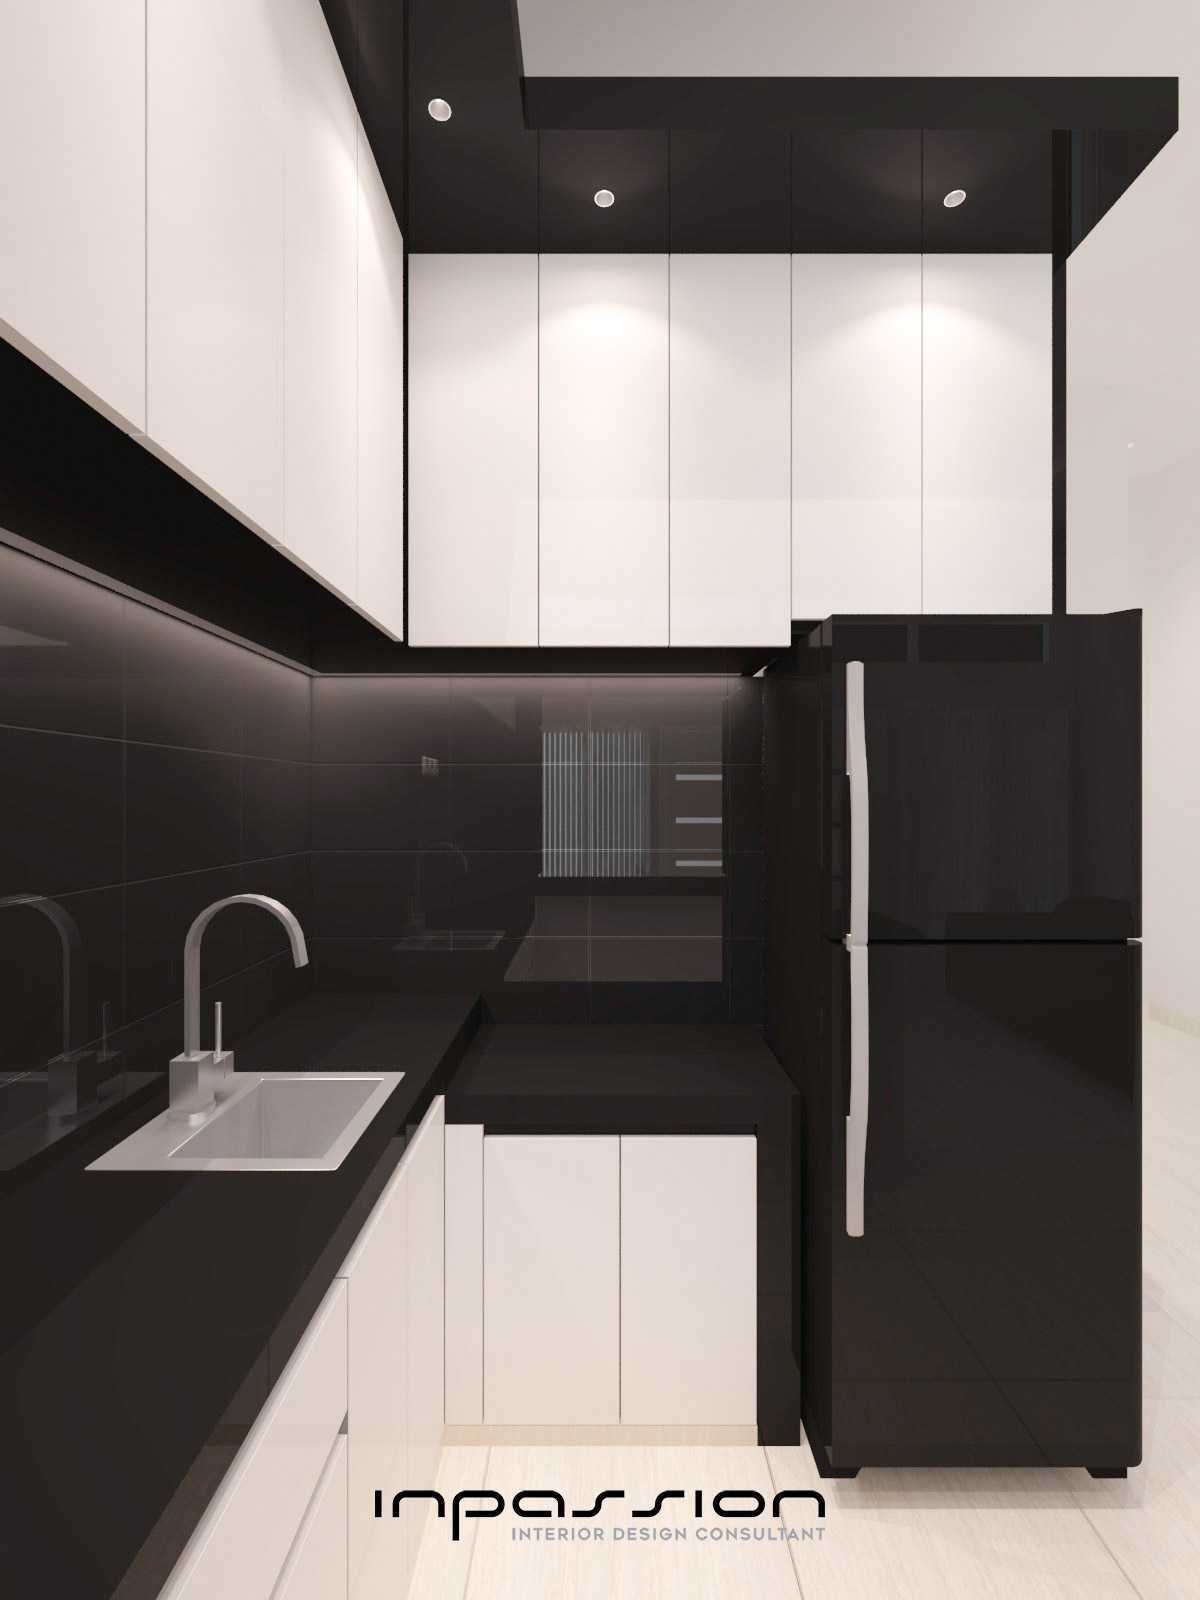 Inpassion Interior Design Kitchen Design - Ms. Melisa Surabaya Surabaya Psx20170213133227 Minimalist  27558